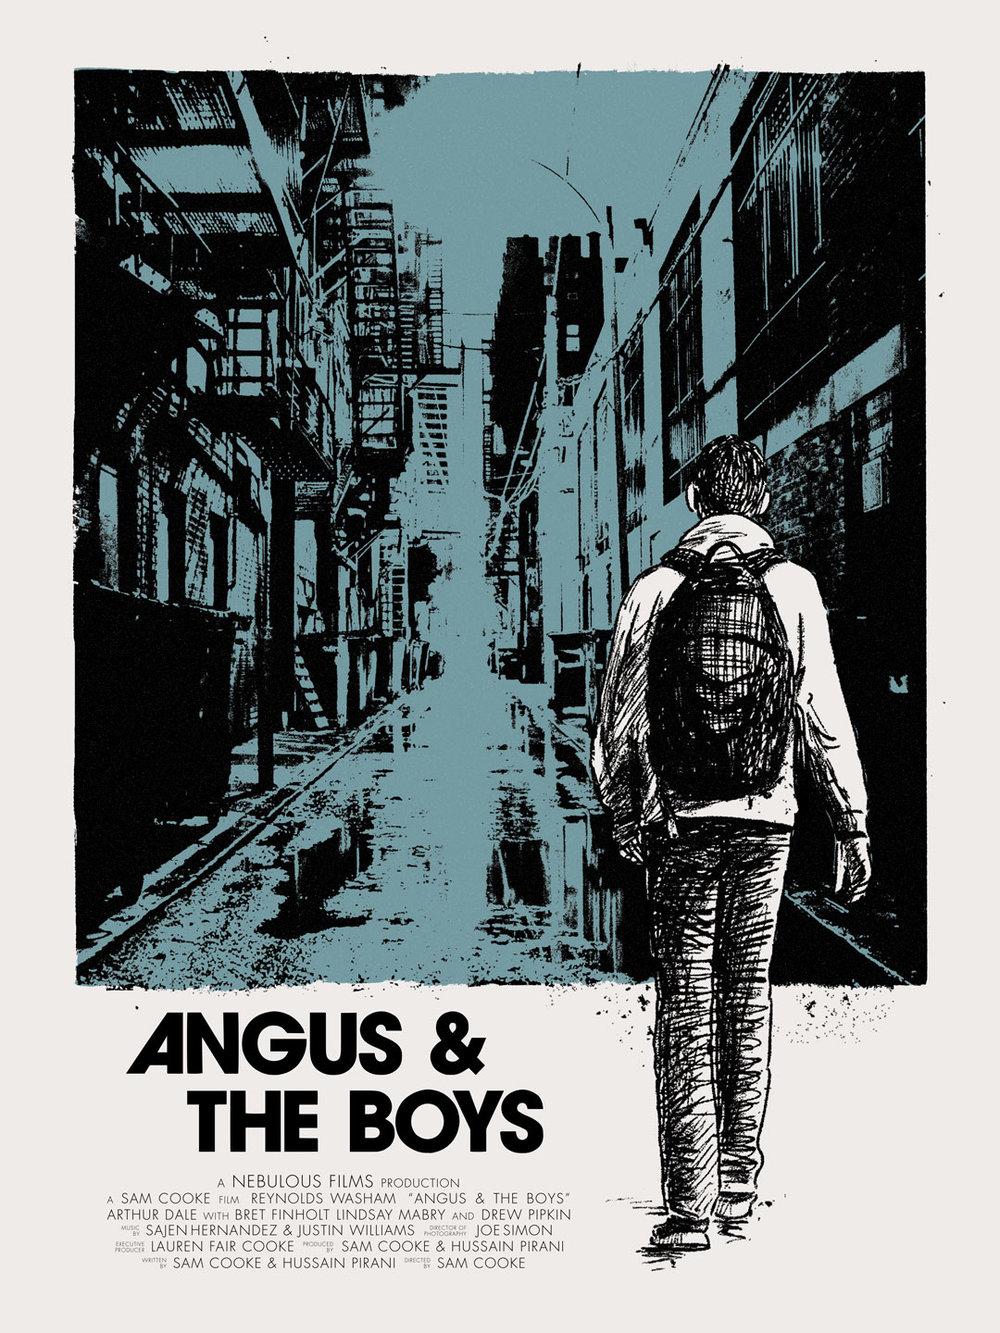 AngusandtheBoys_Poster_18x24.jpg